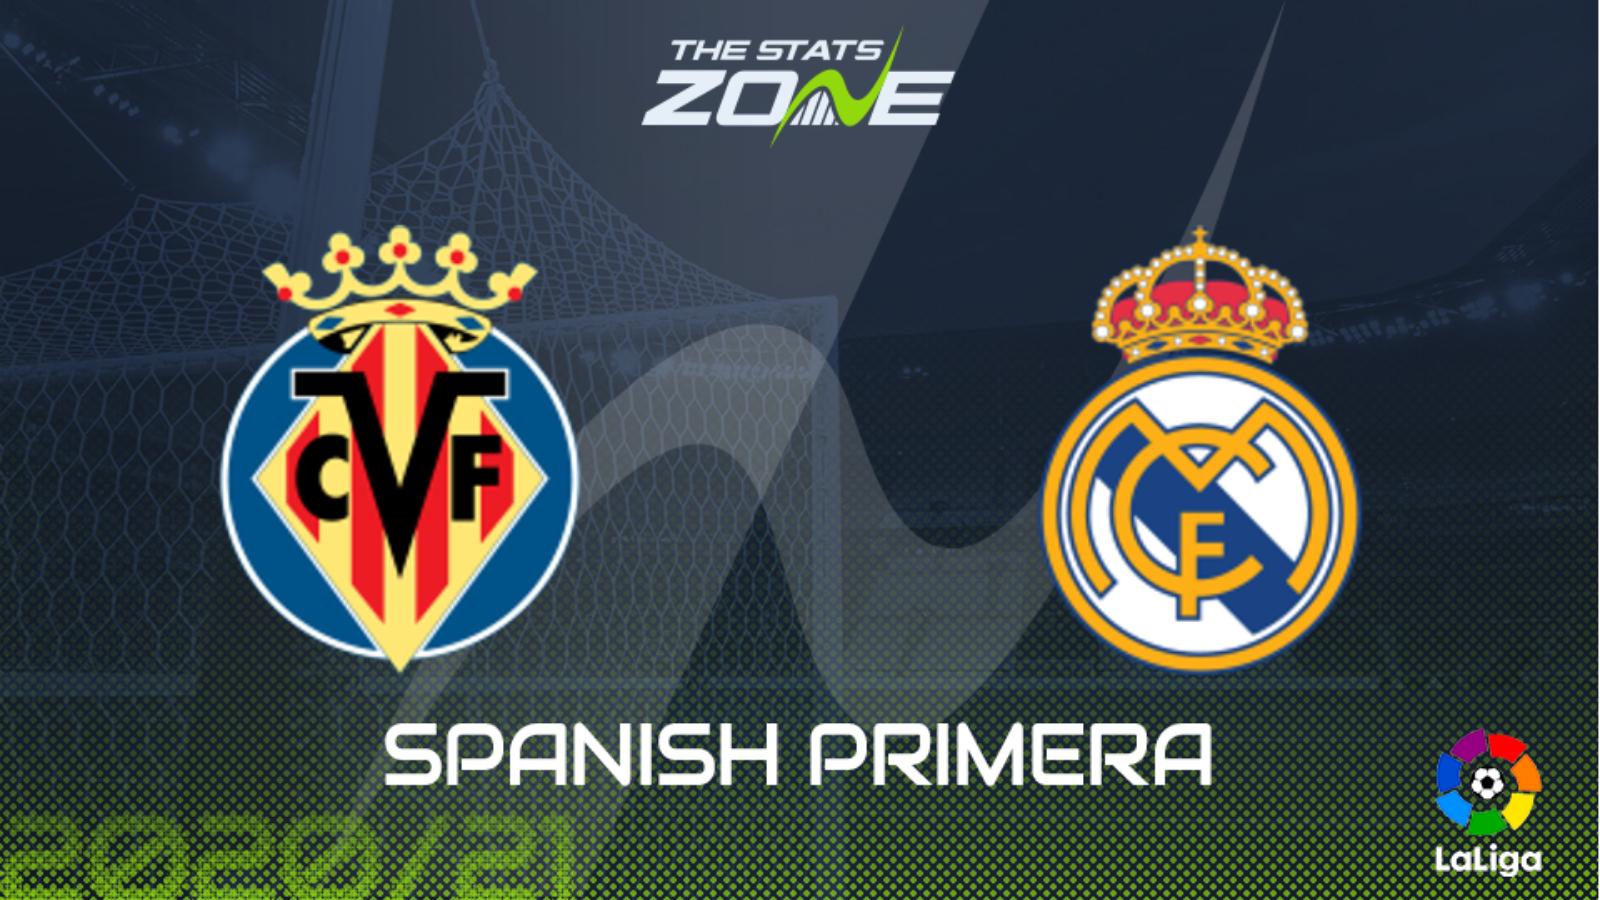 Villarreal vs real madrid betting preview betting zone naps table uk